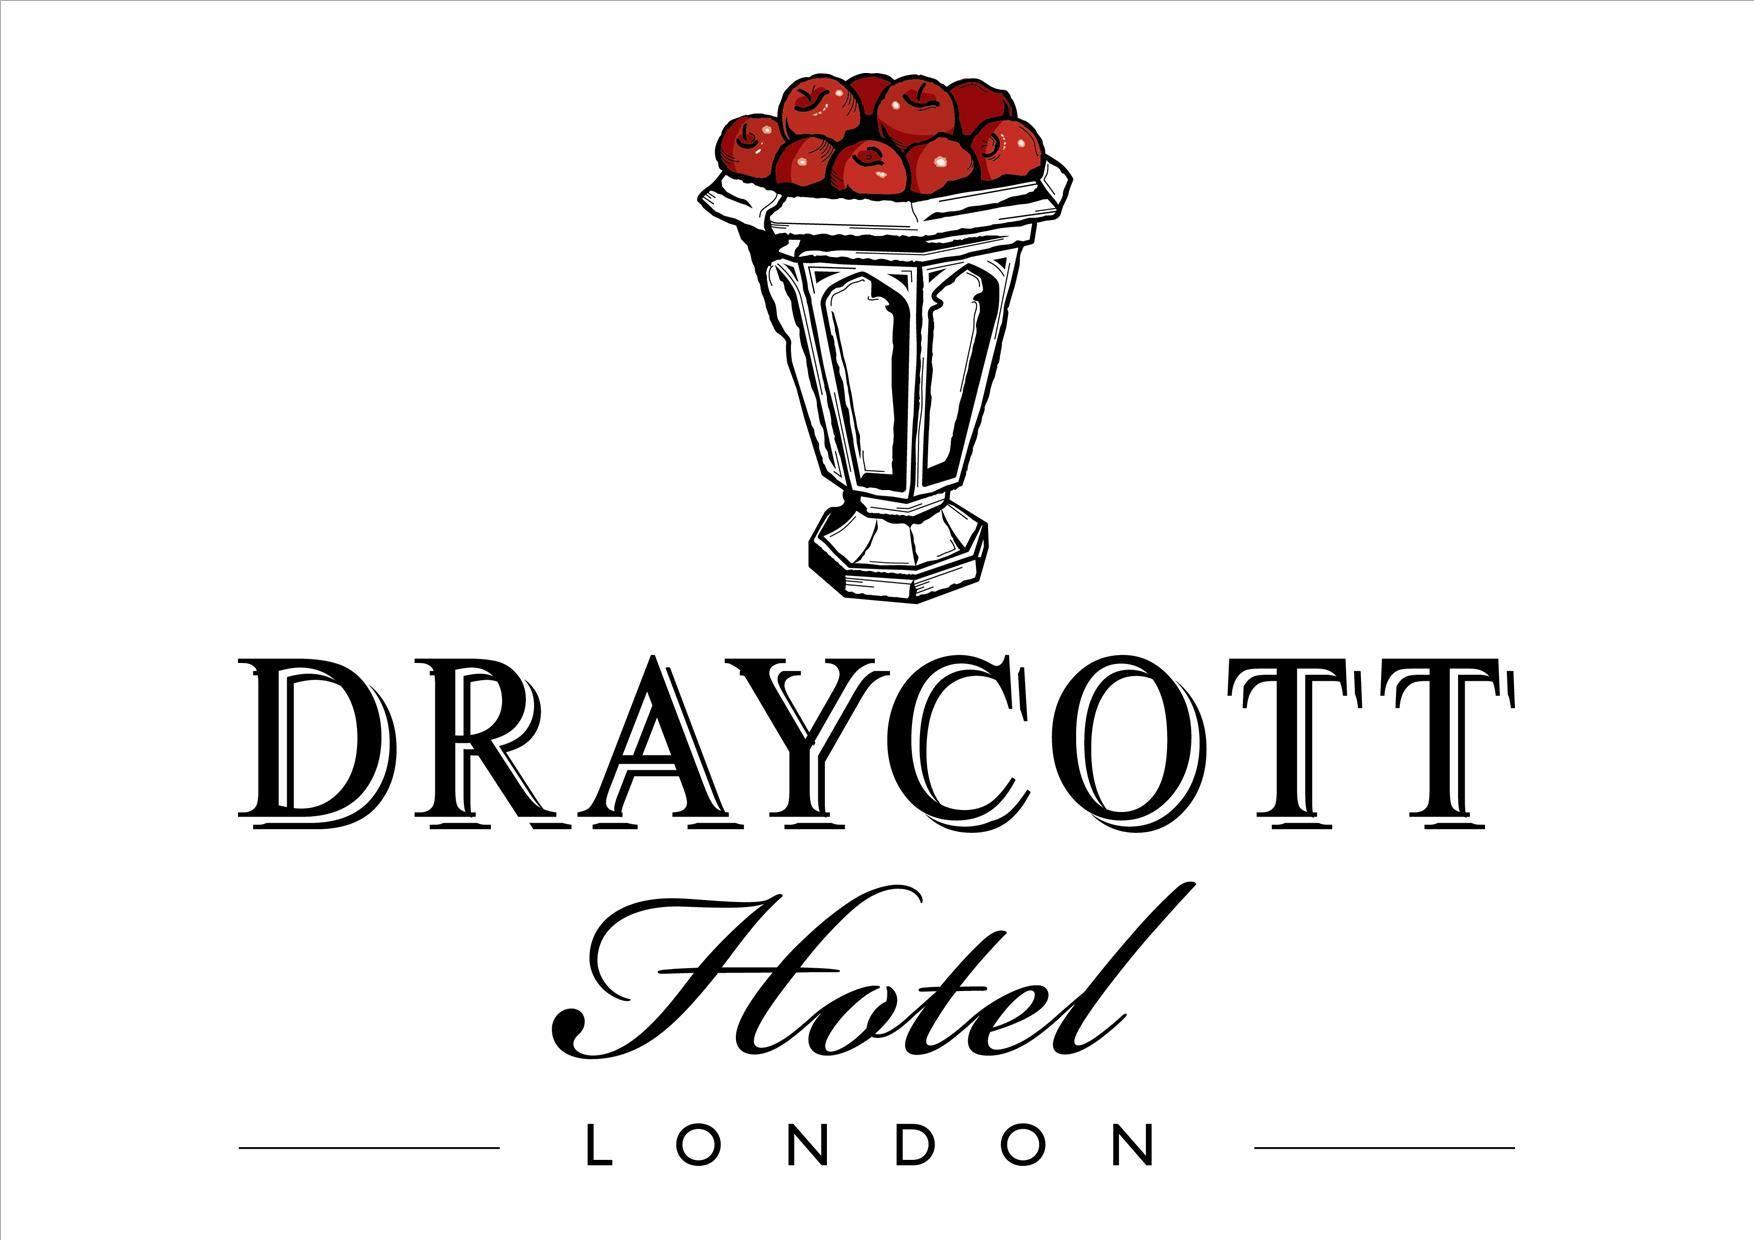 The Draycott Hotel